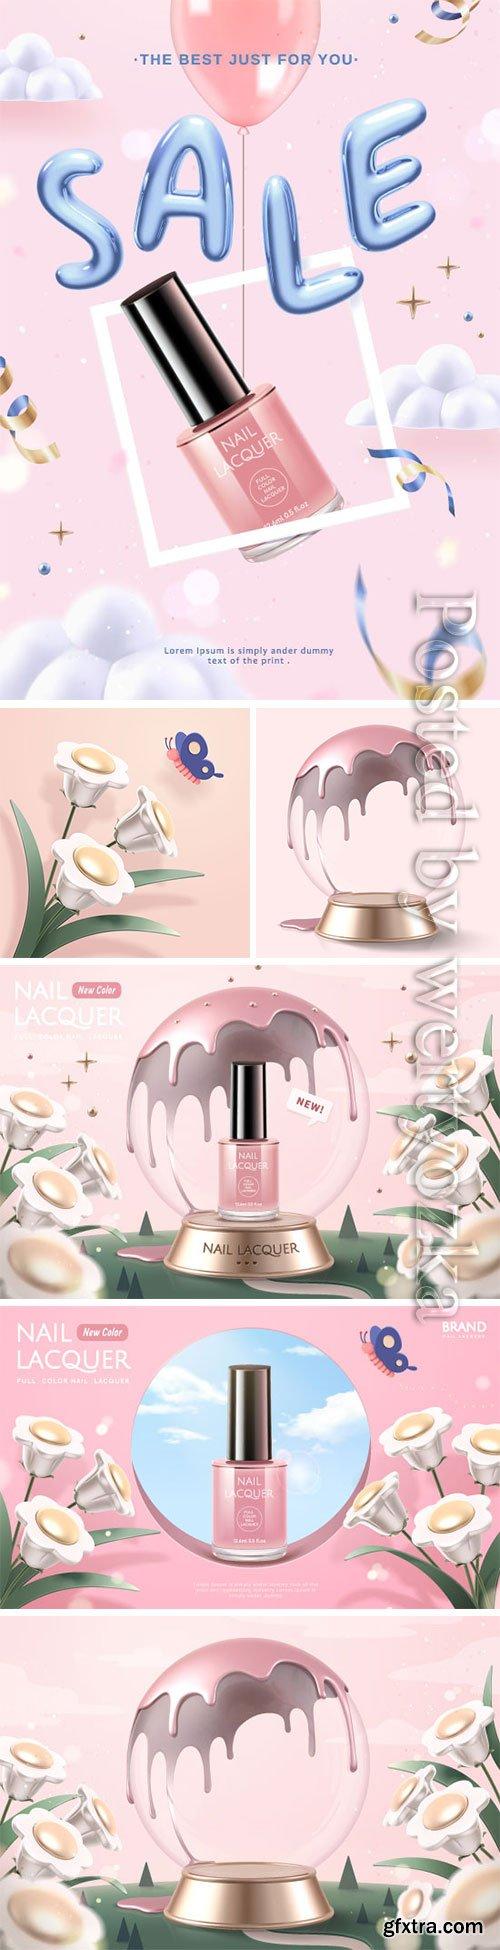 Cosmetics advertising vector posters, perfume, cream, nail polish # 4